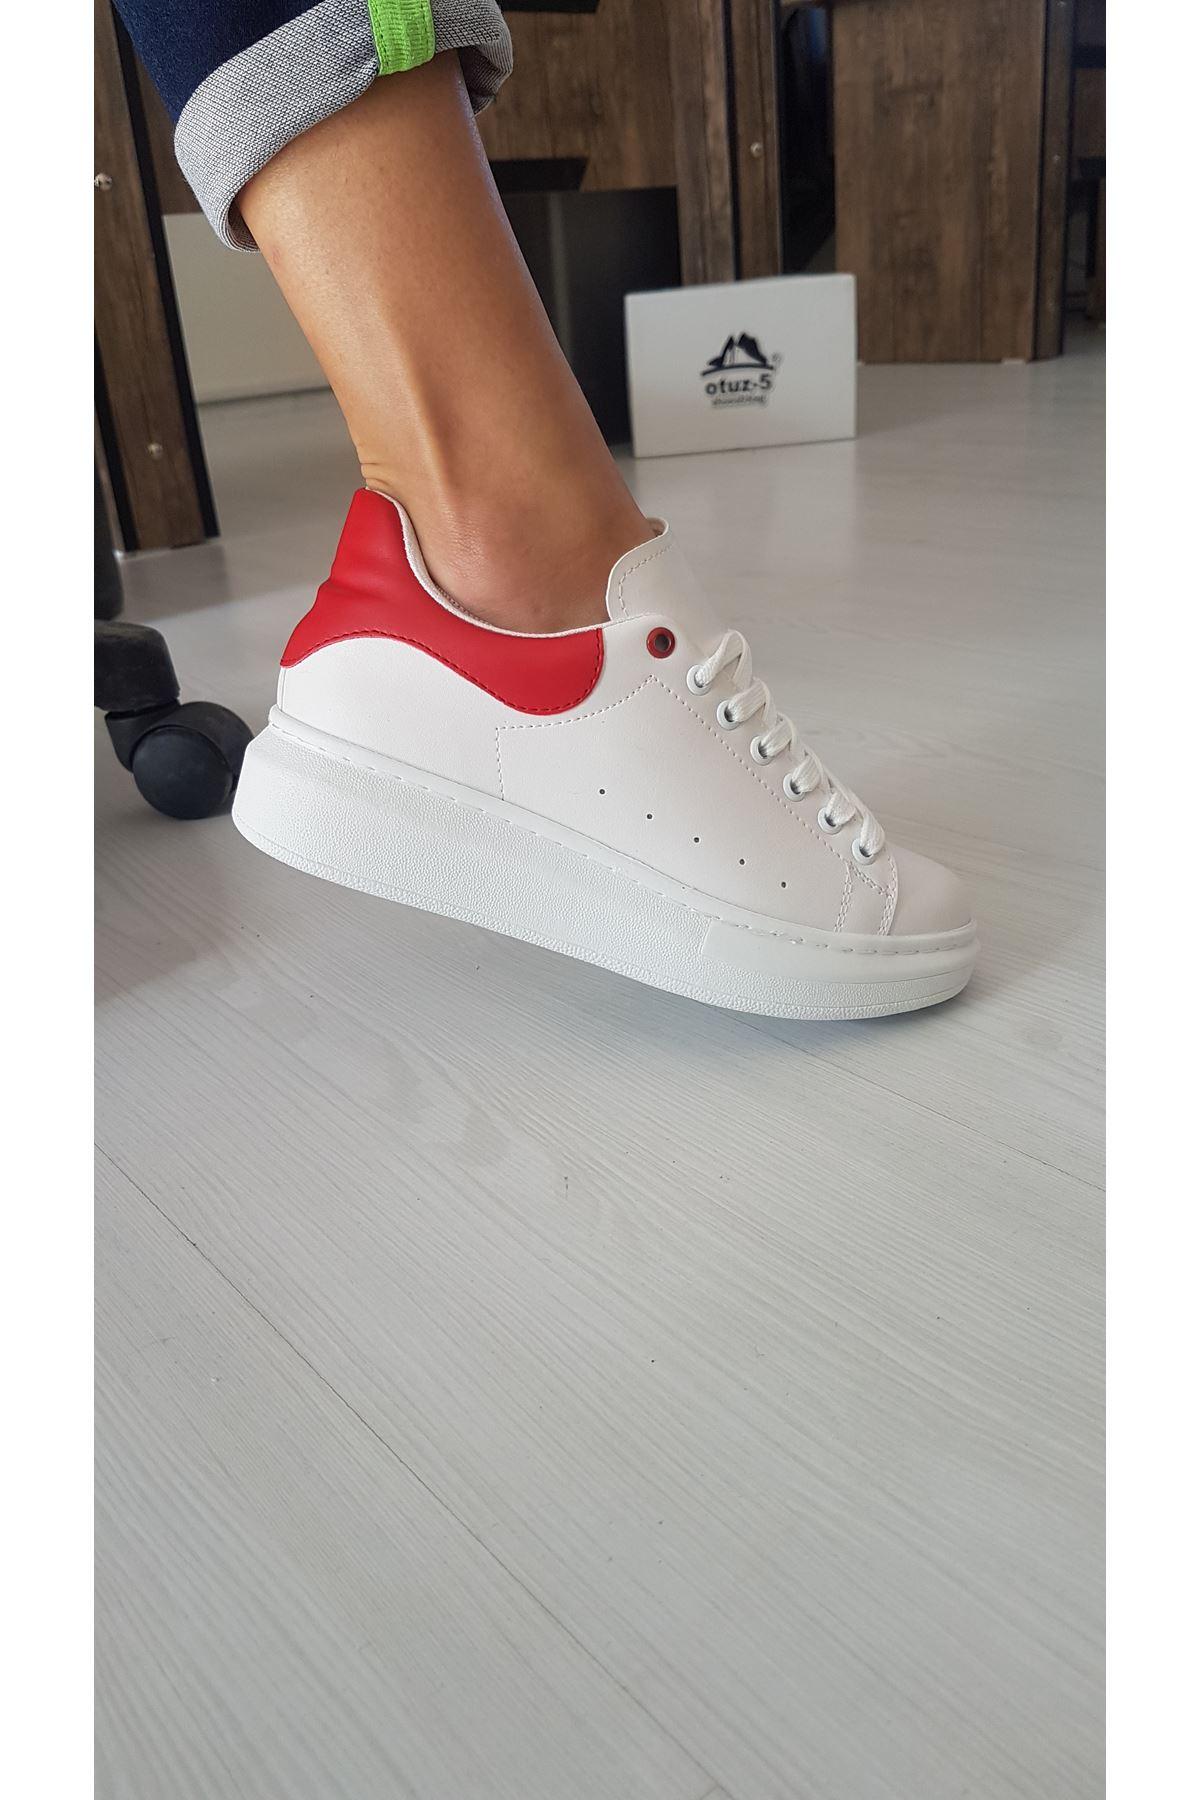 Lucy Mat Deri Kırmızı Detay Sneakers Beyaz